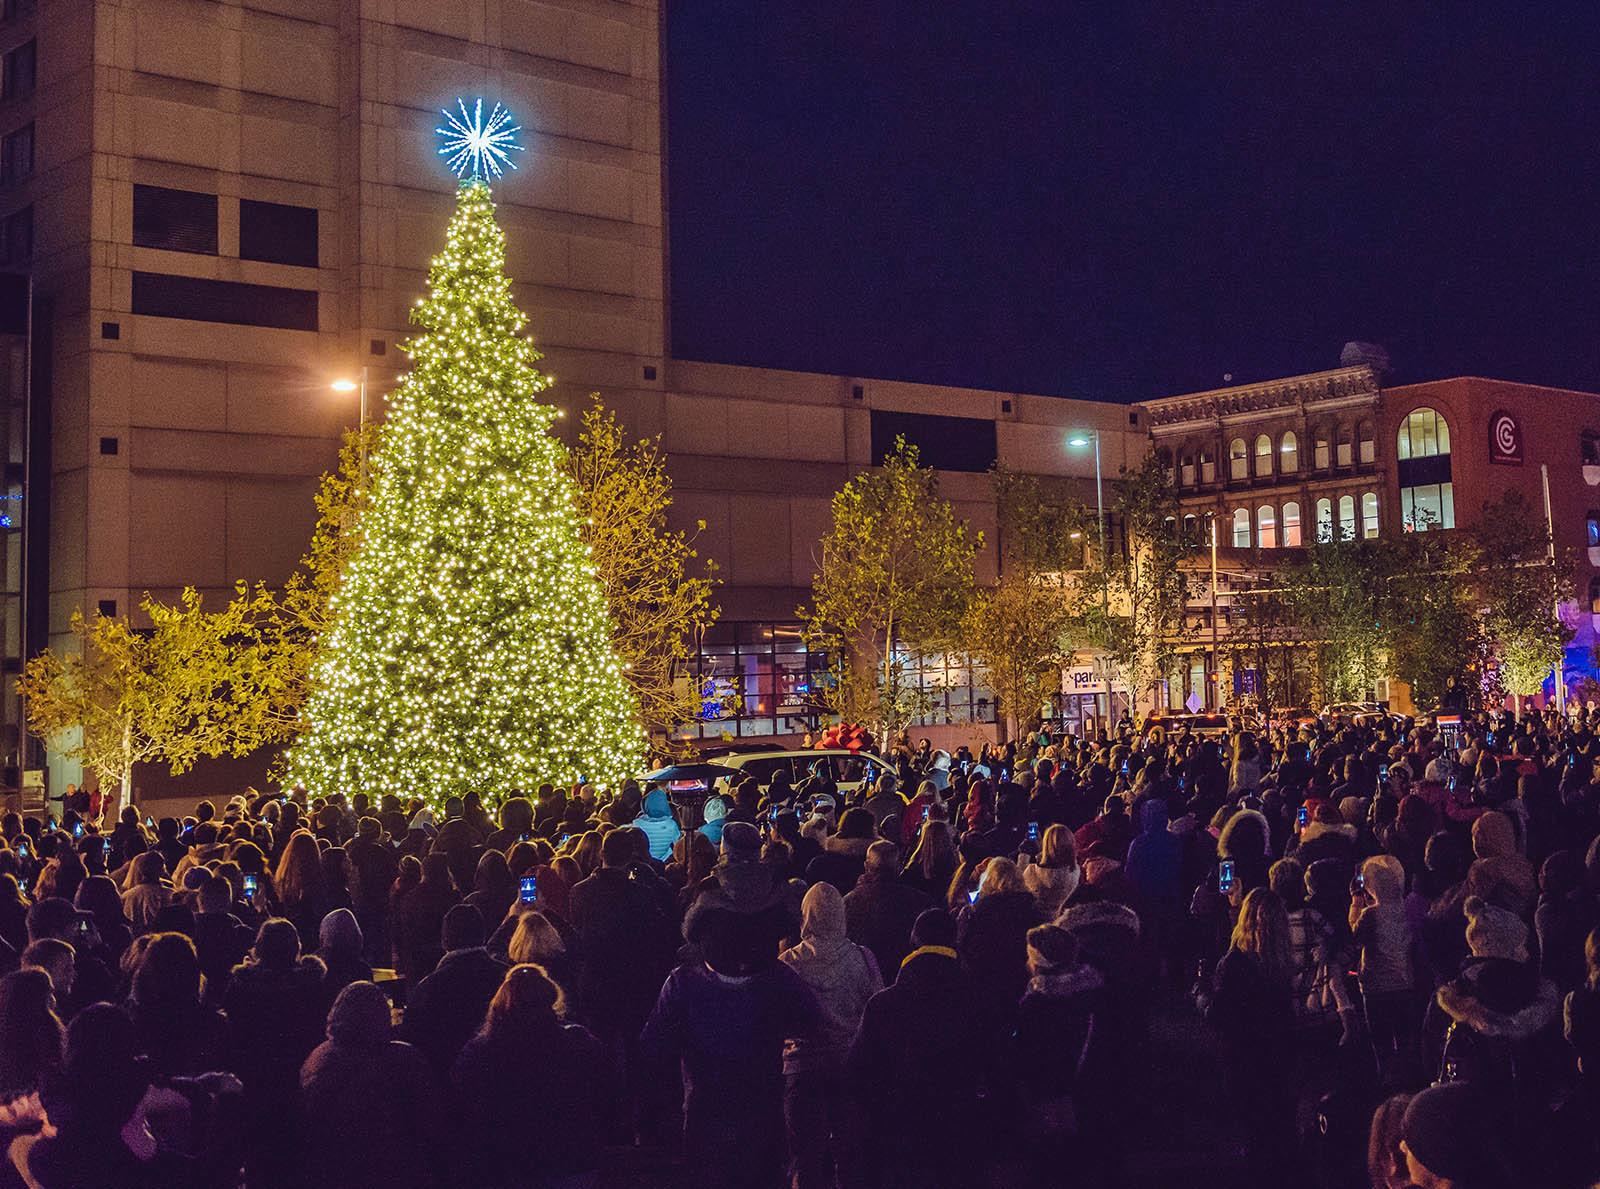 hensvilleparkchristmastree.jpg